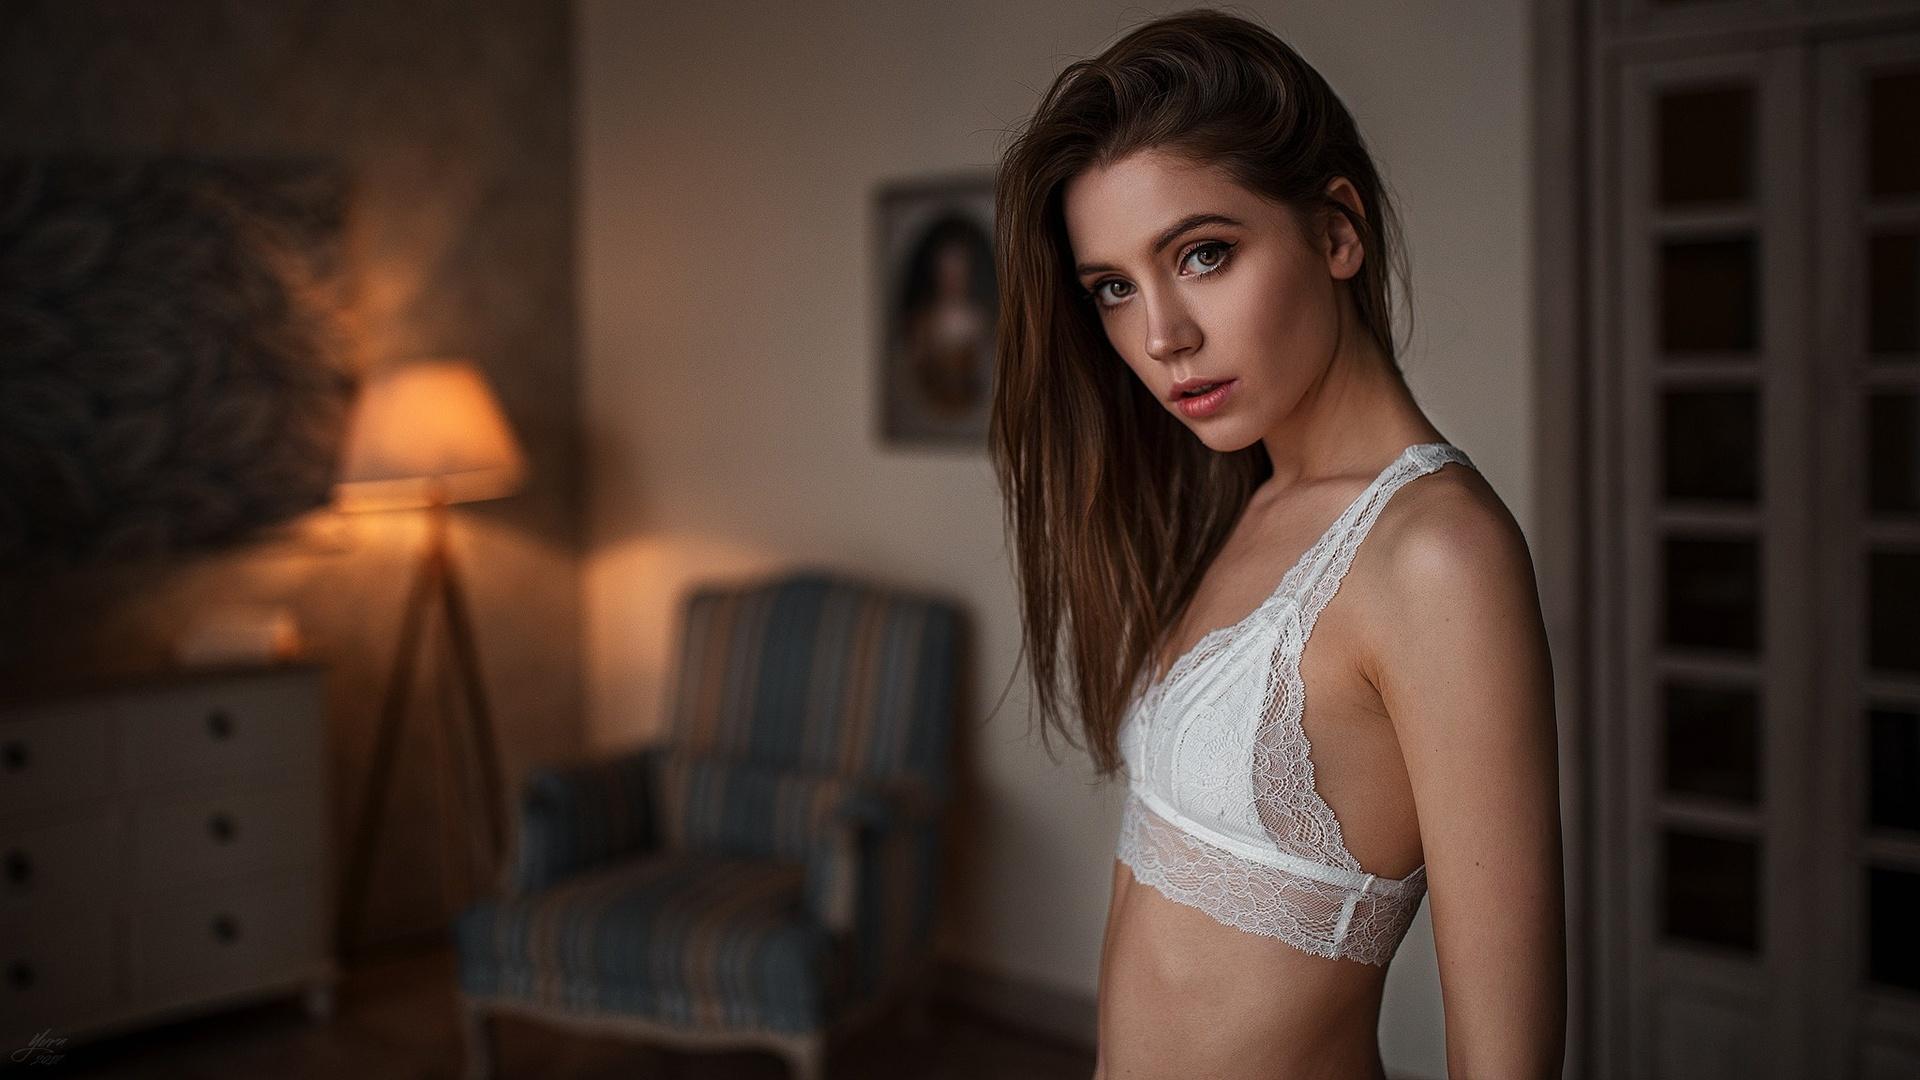 free-amateur-sexy-brunette-petite-women-nude